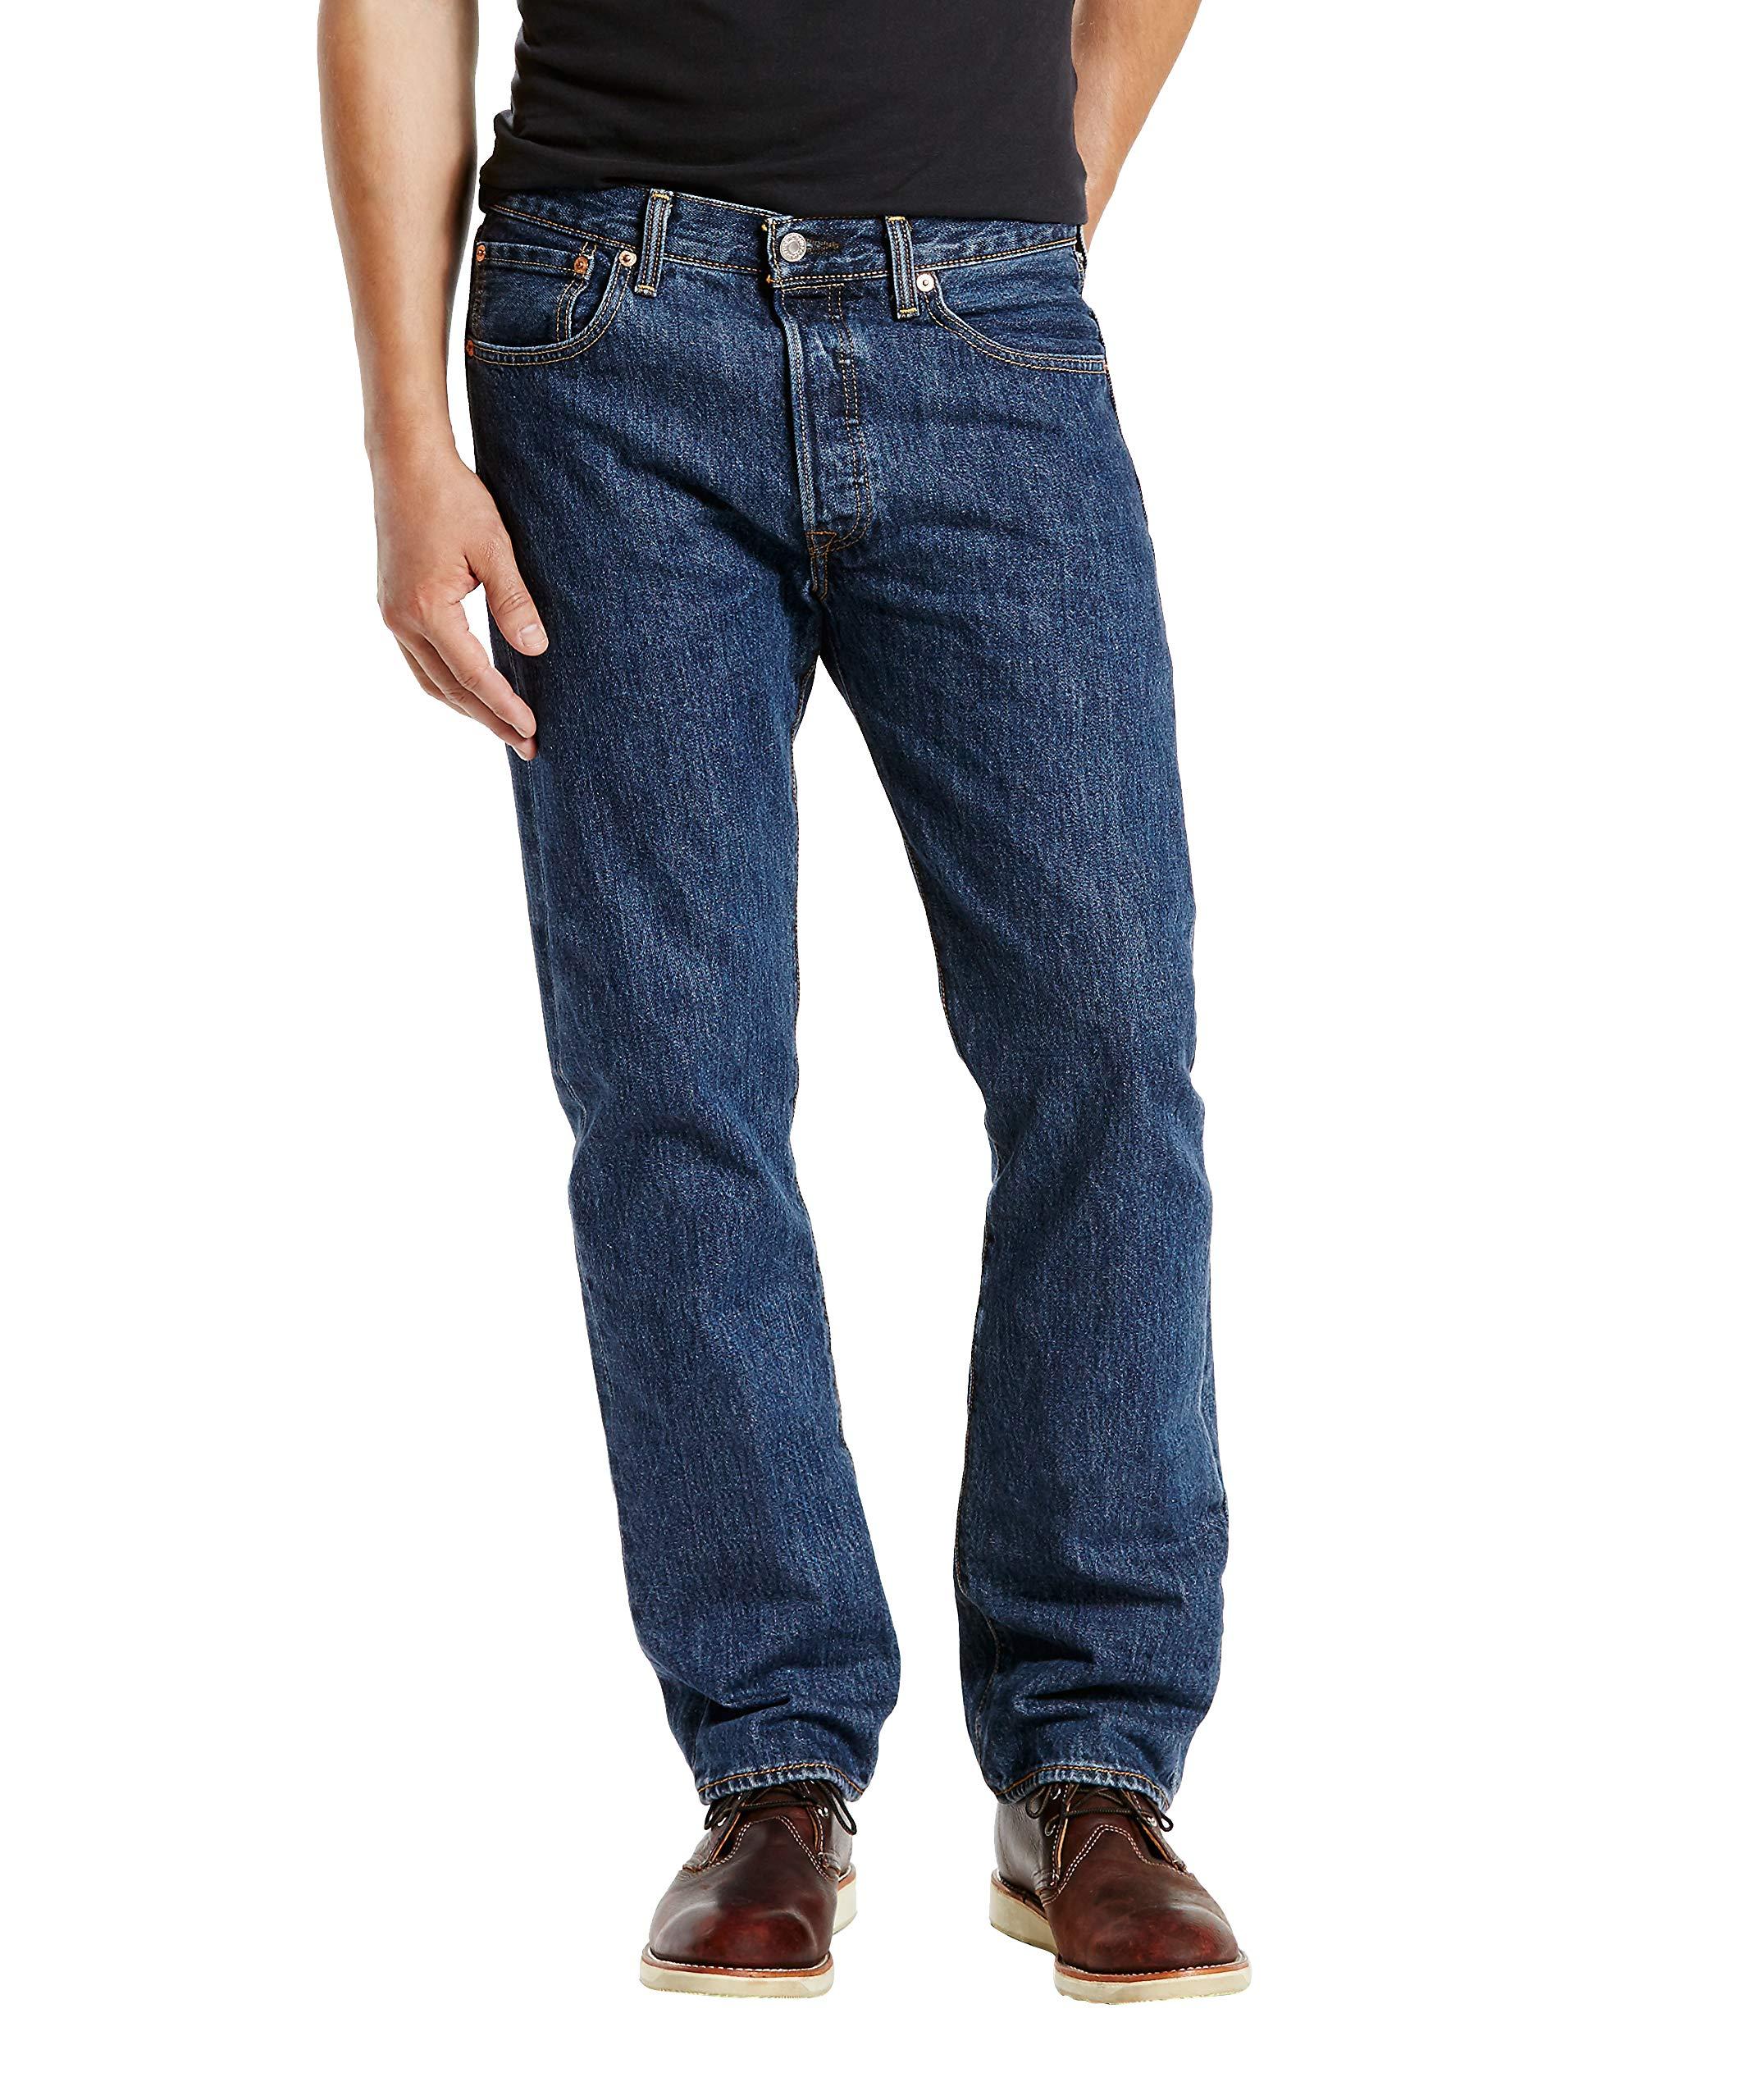 Levi's Men's 501 Original Fit Jean, Dark Stonewash, 34x32 by Levi's